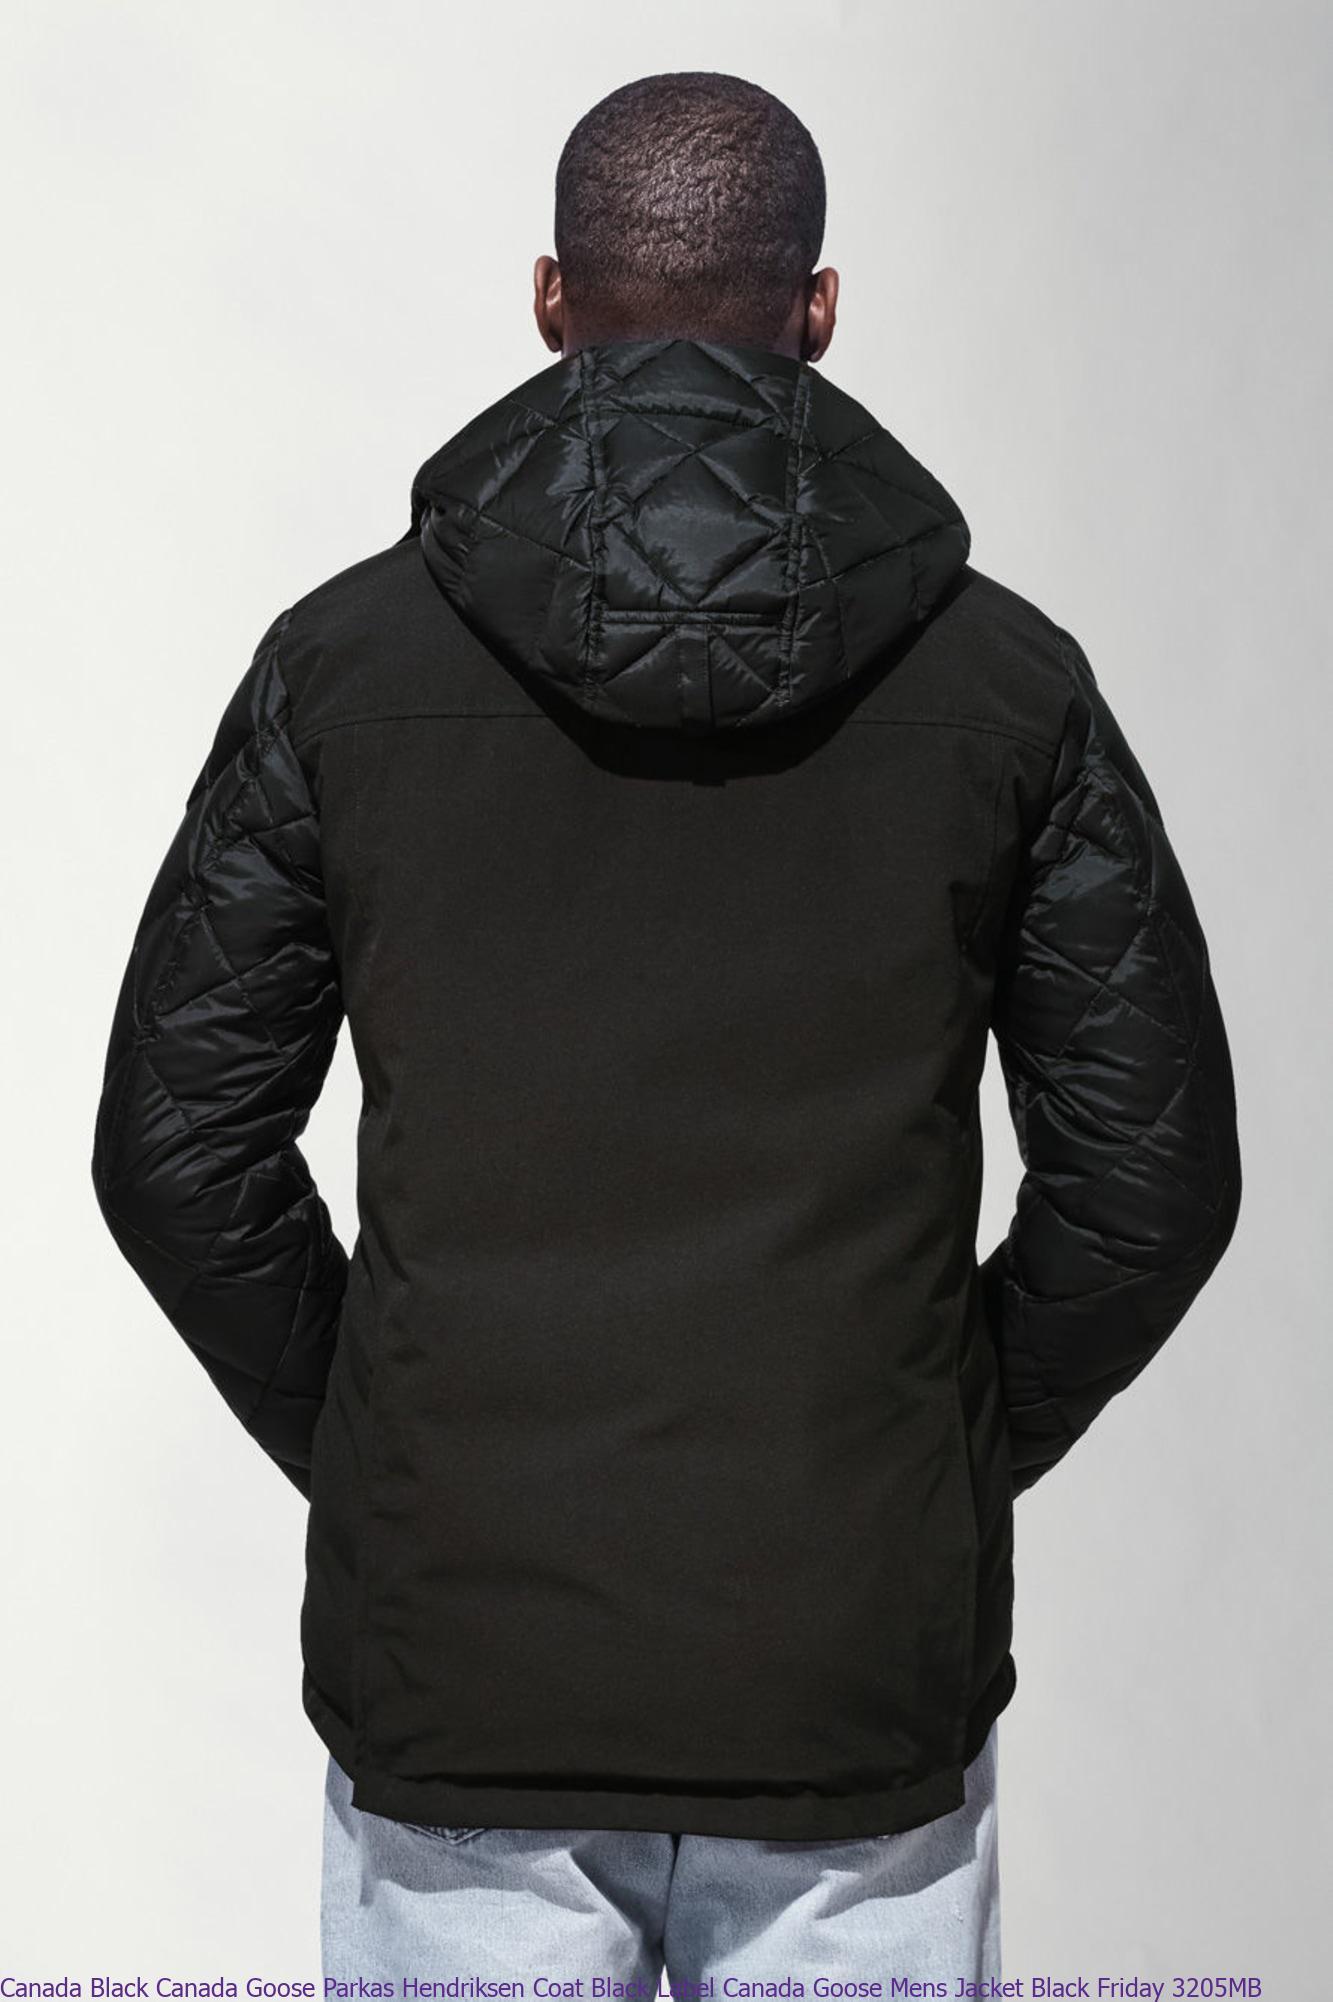 Canada Black Canada Goose Parkas Hendriksen Coat Black ...